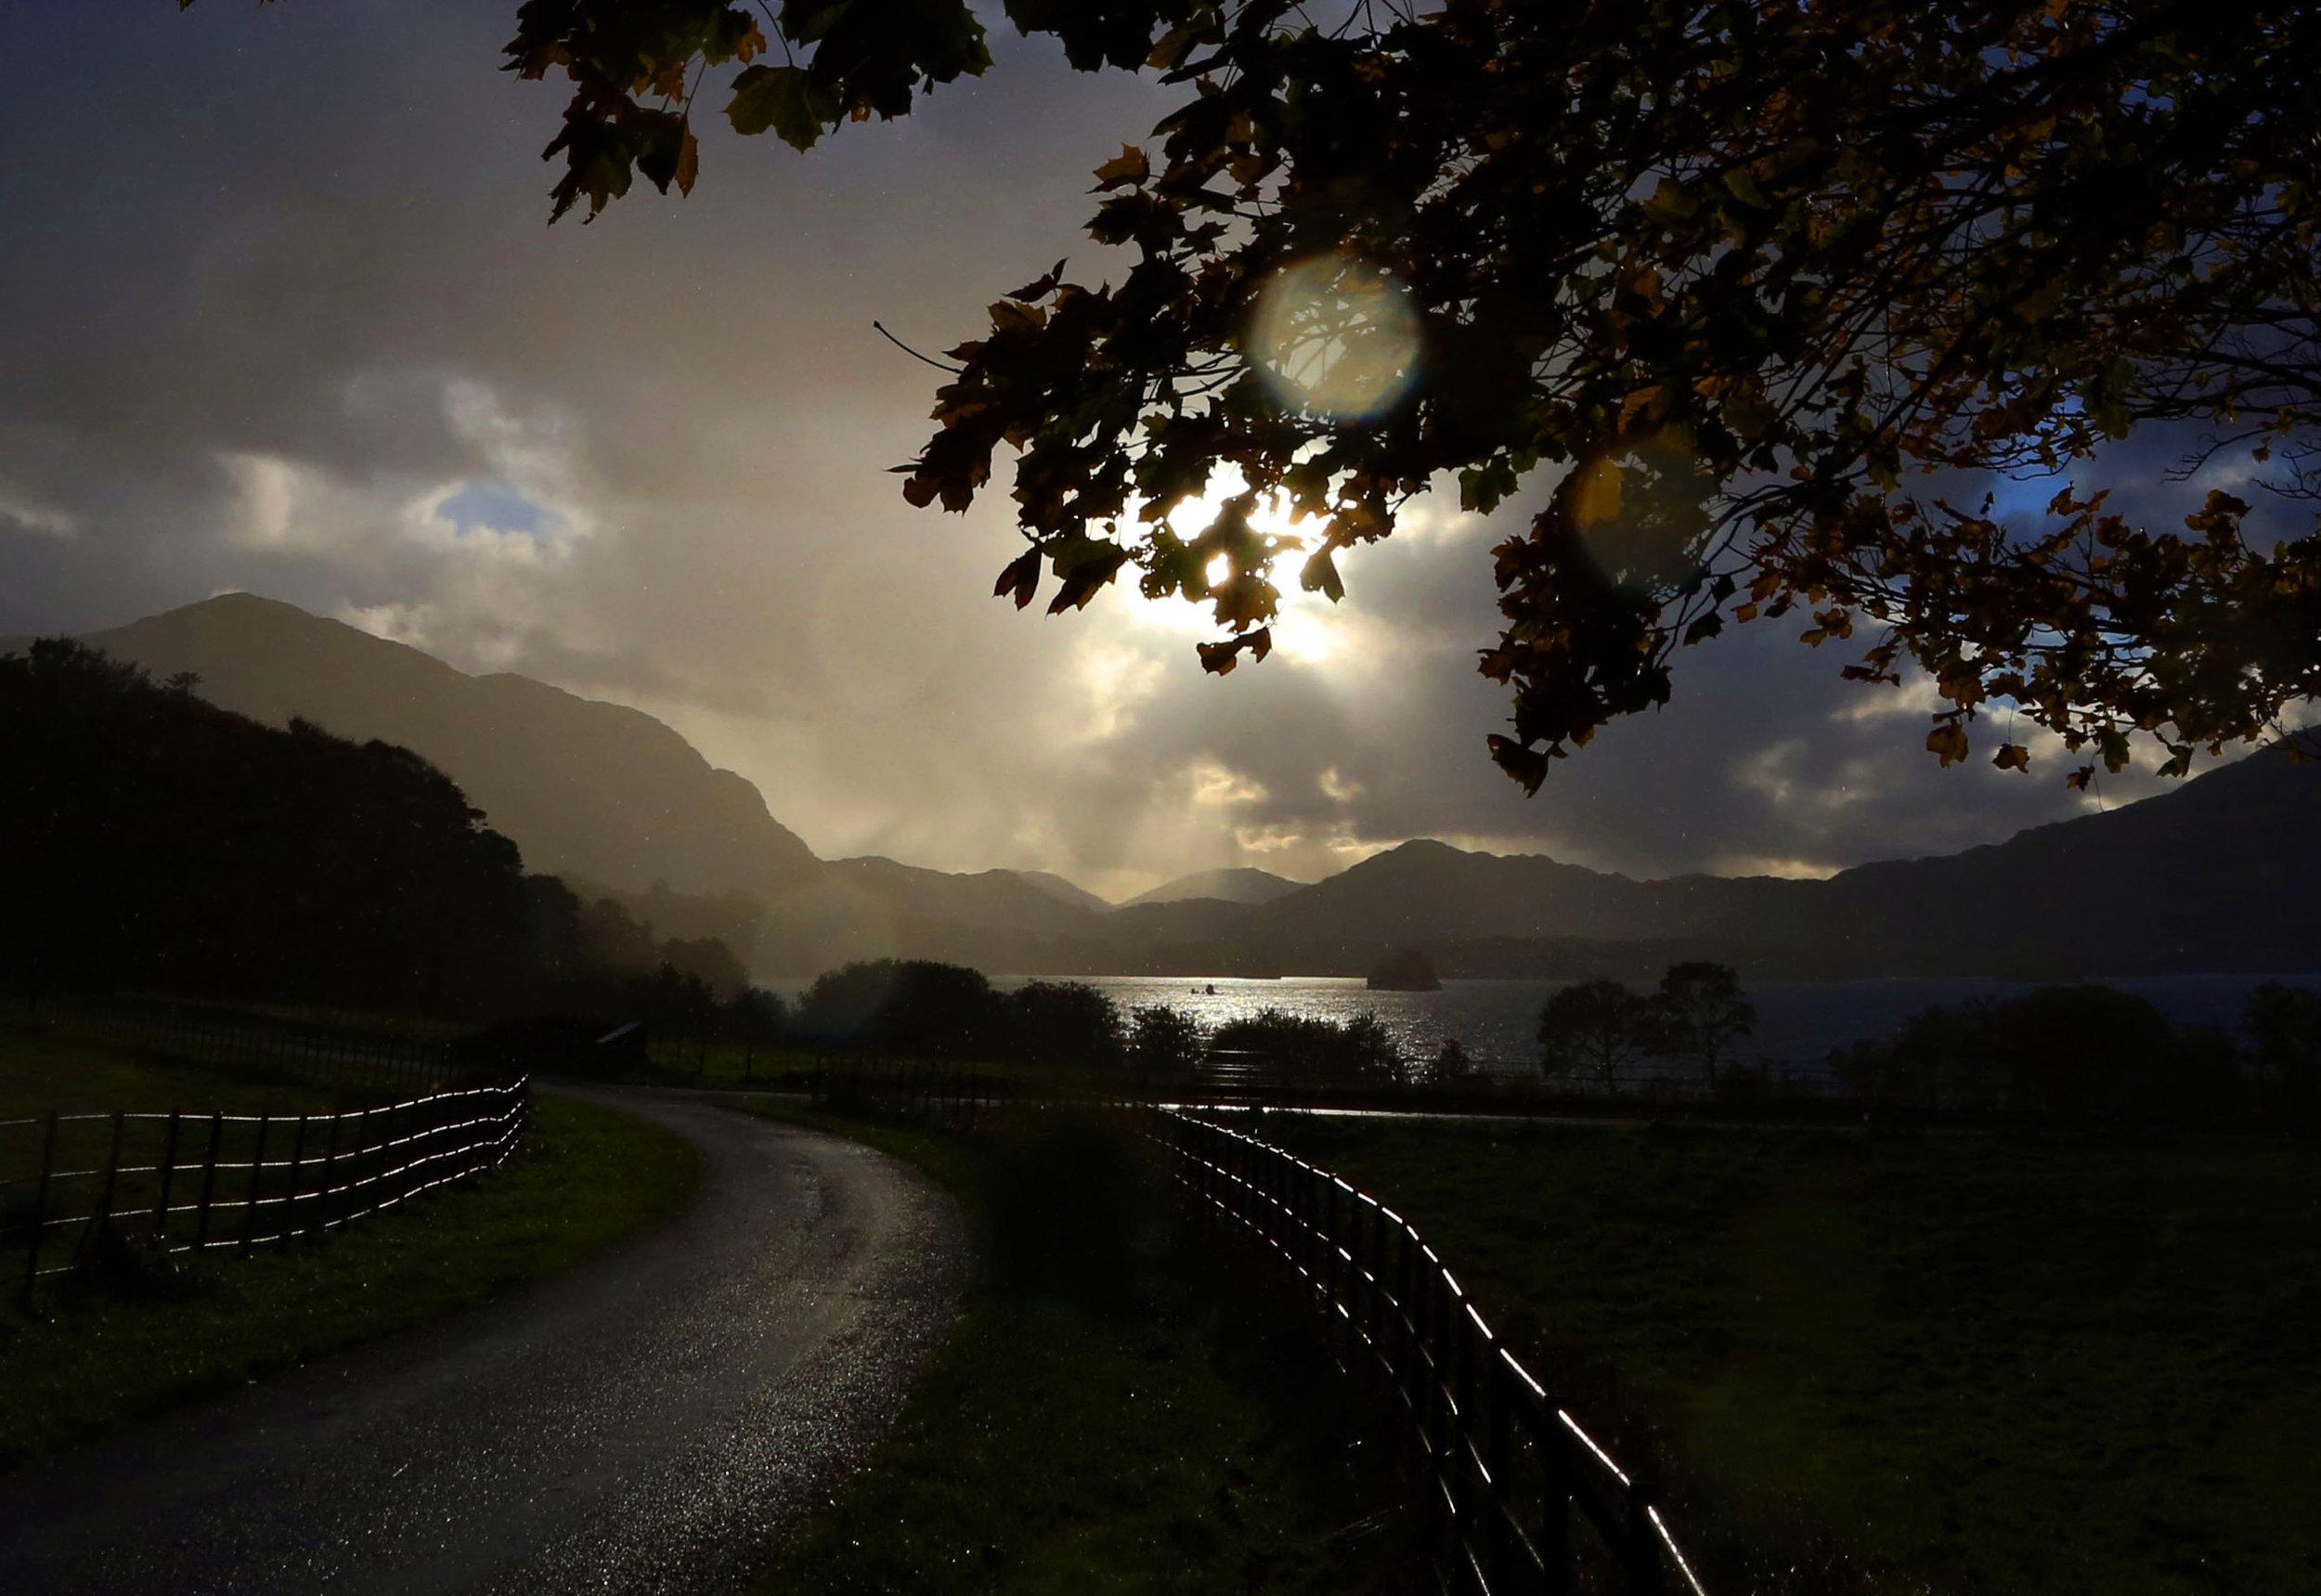 Muckross Lake in Killarney National Park, Ireland